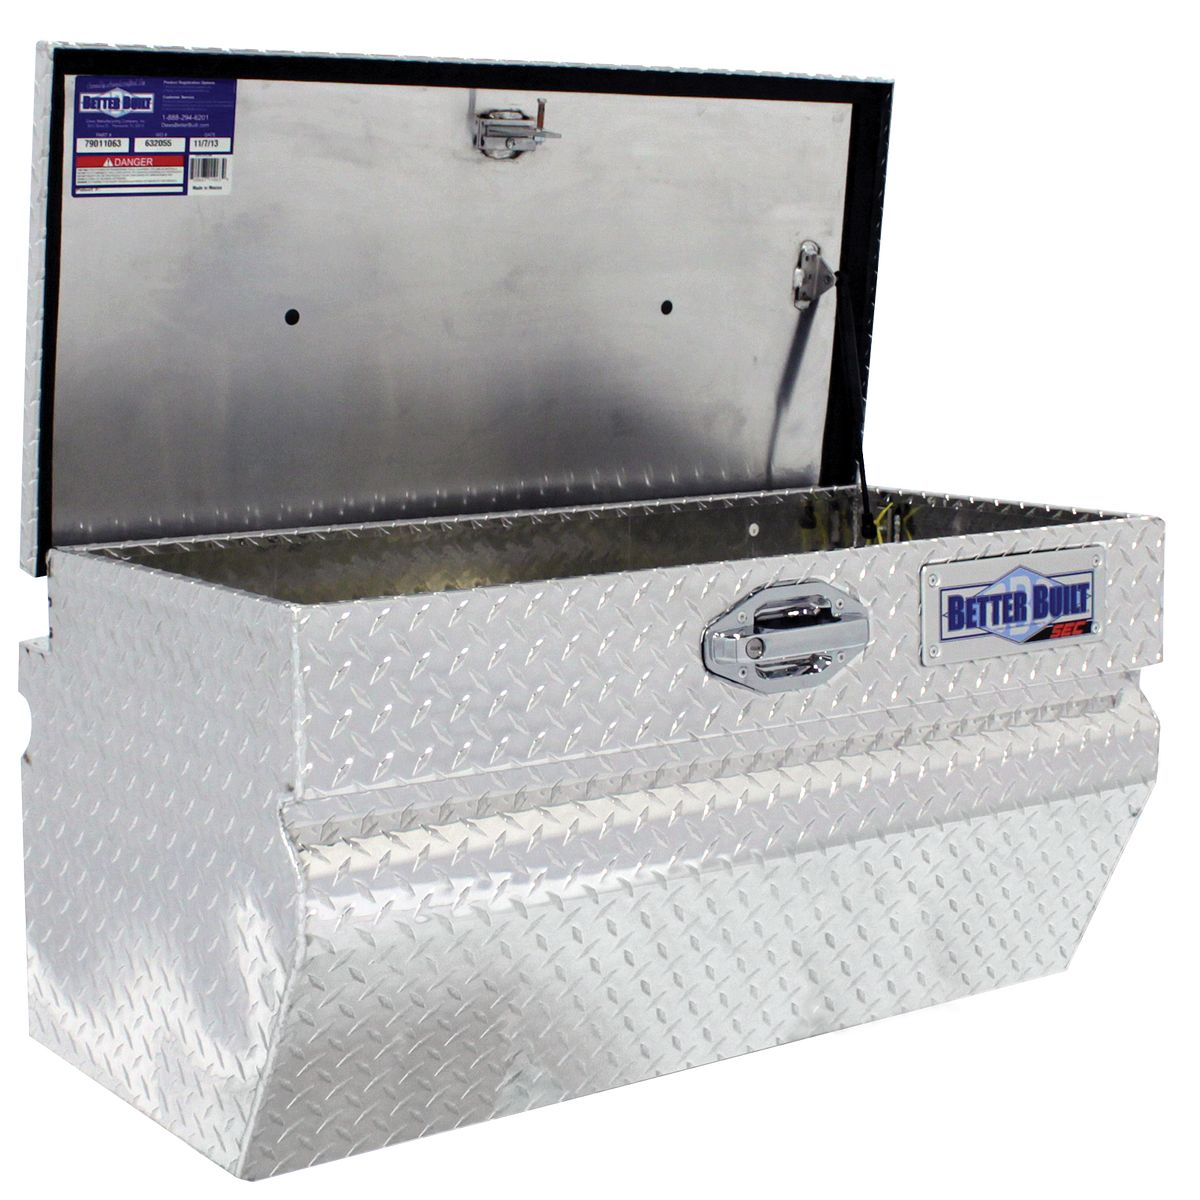 Better Built 79011063 Tool Box